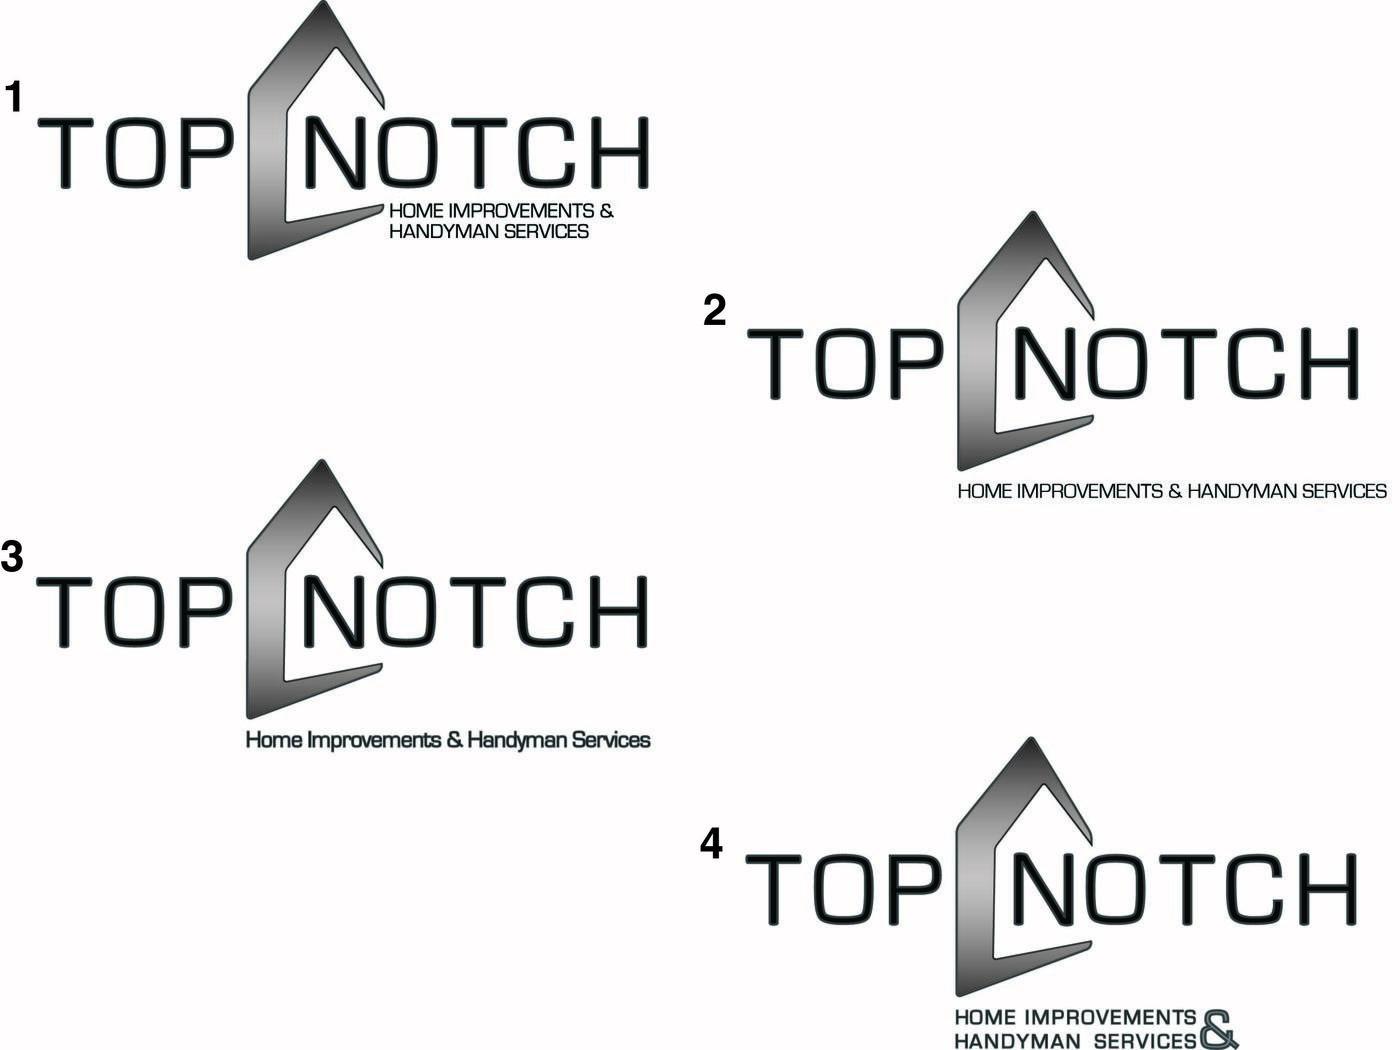 Top Notch Logo Design by Yamairah Keller at Coroflot.com